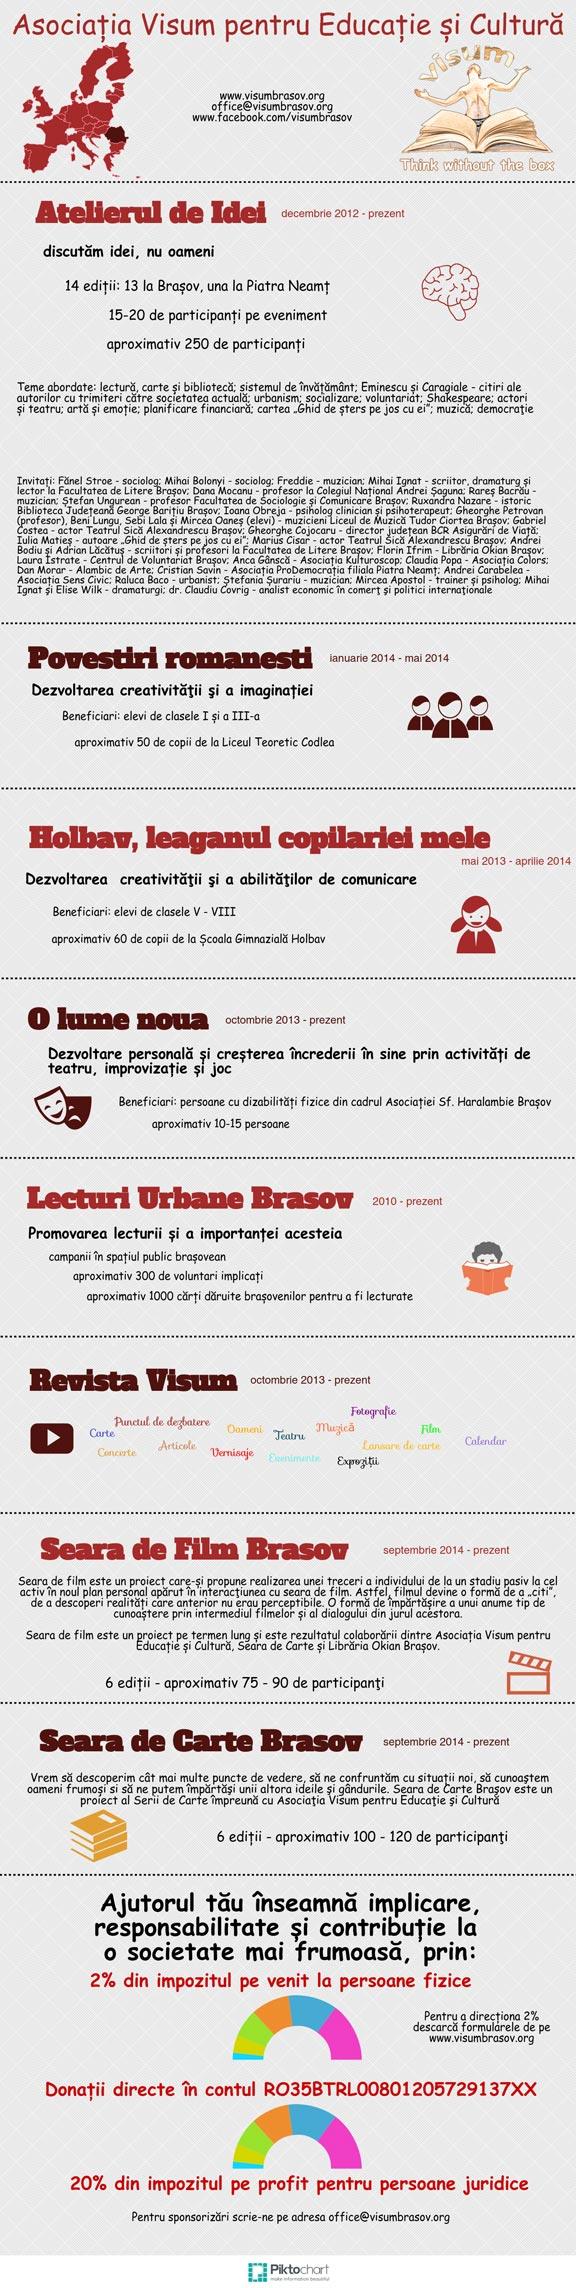 Visum-Infographic-Copy